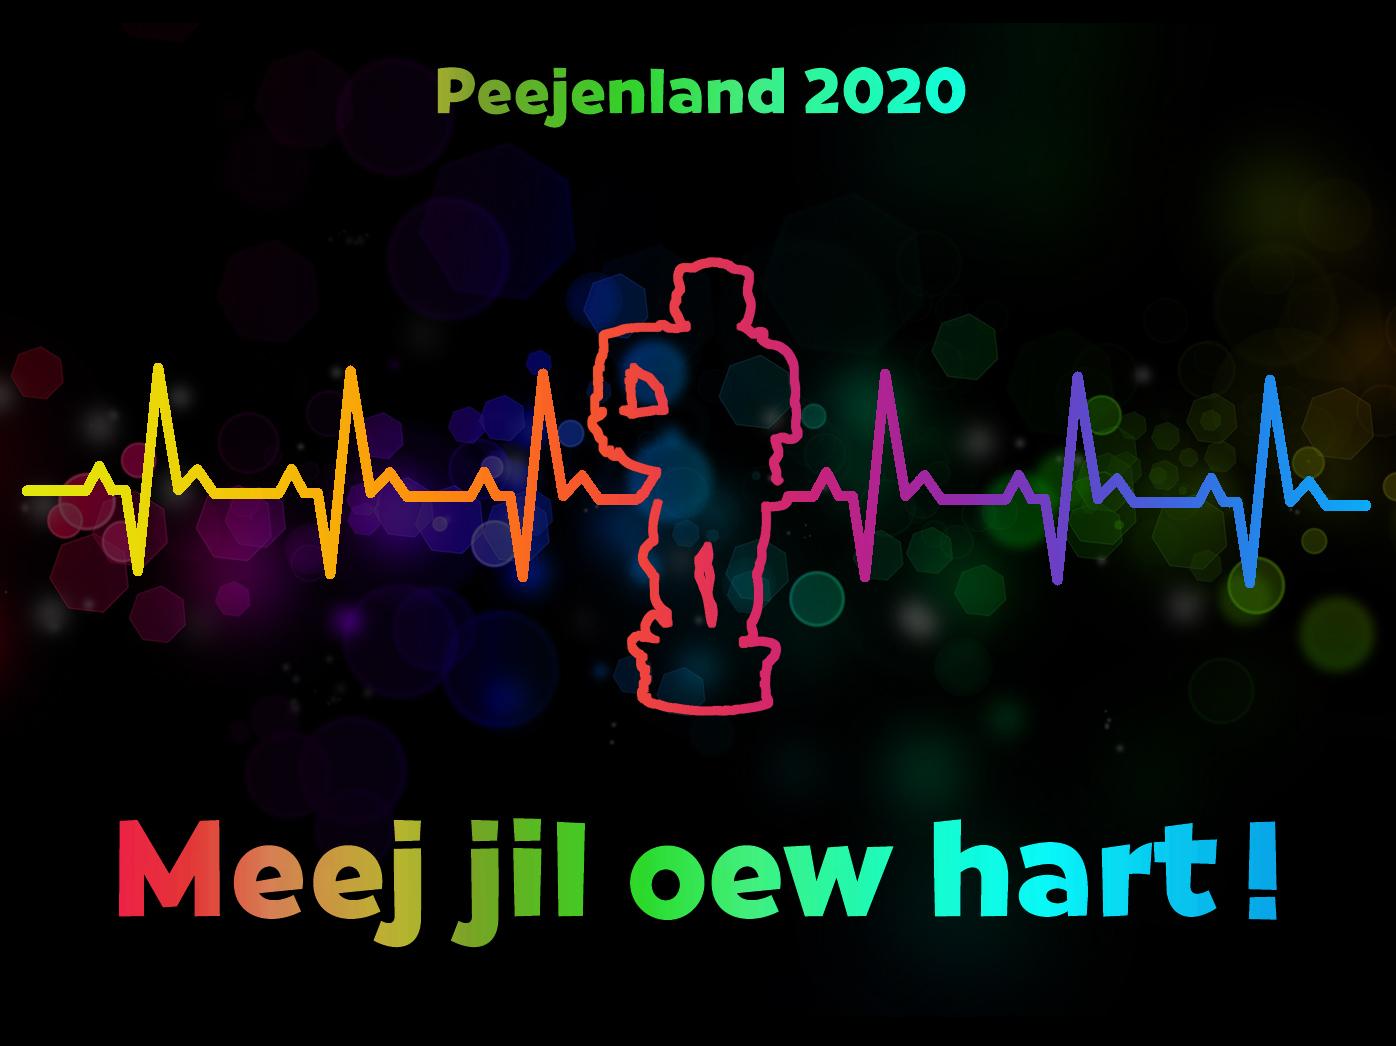 Motto Peejenland 2020